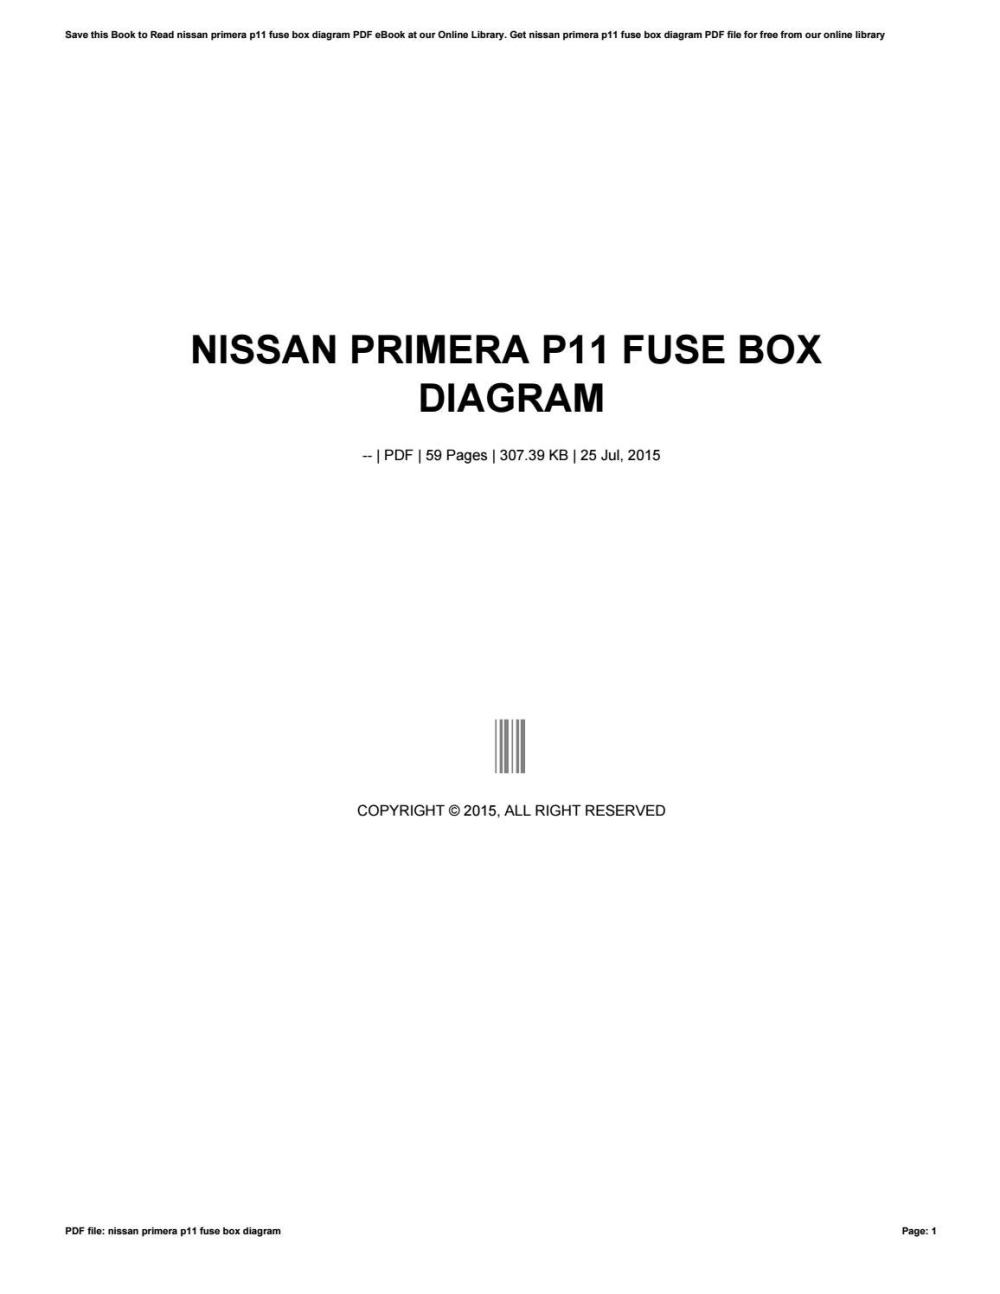 medium resolution of nissan primera fuse box diagram